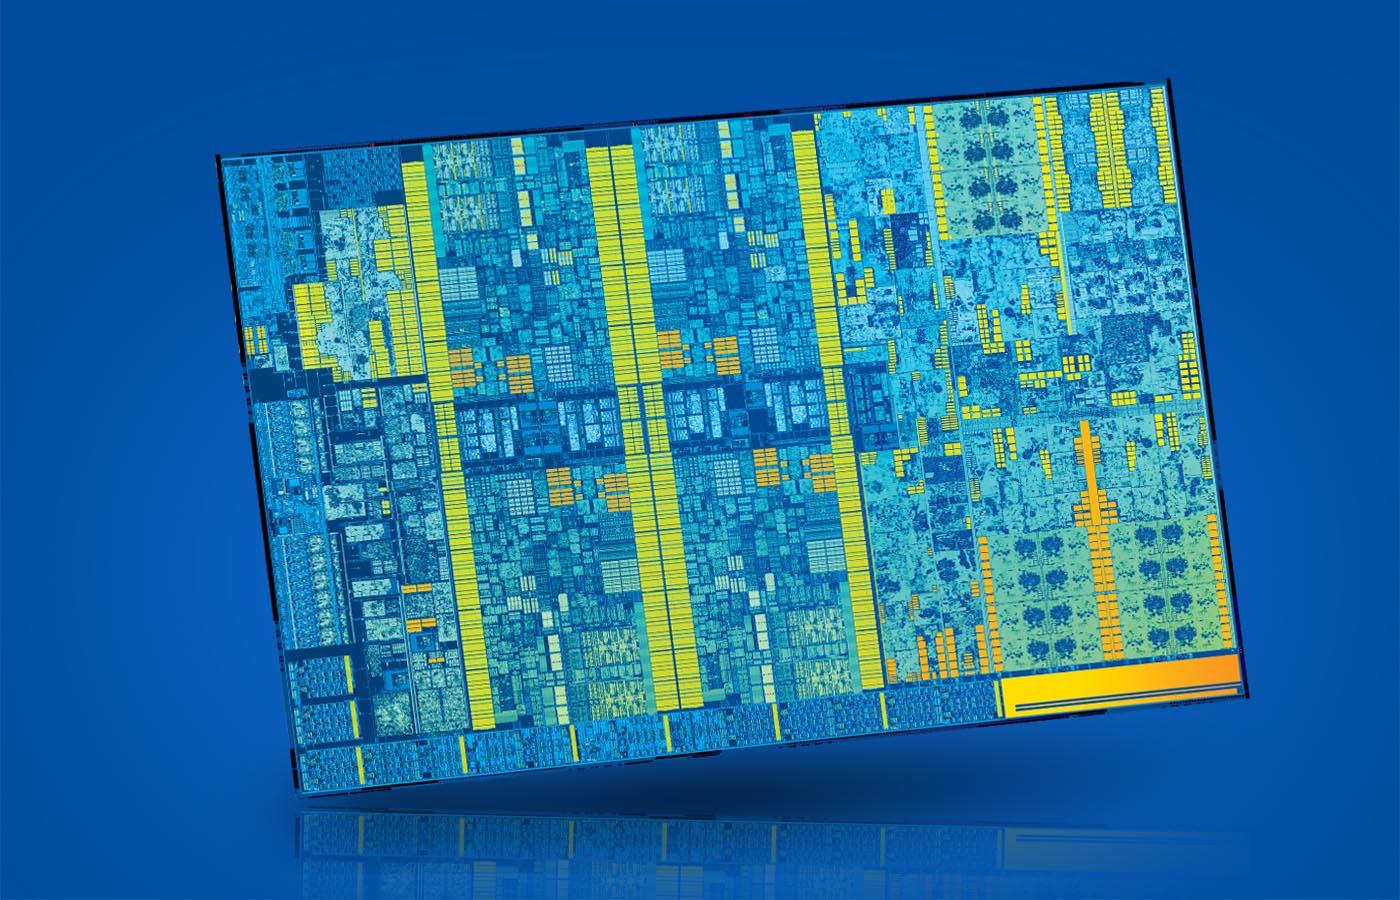 Intel vPro transistores